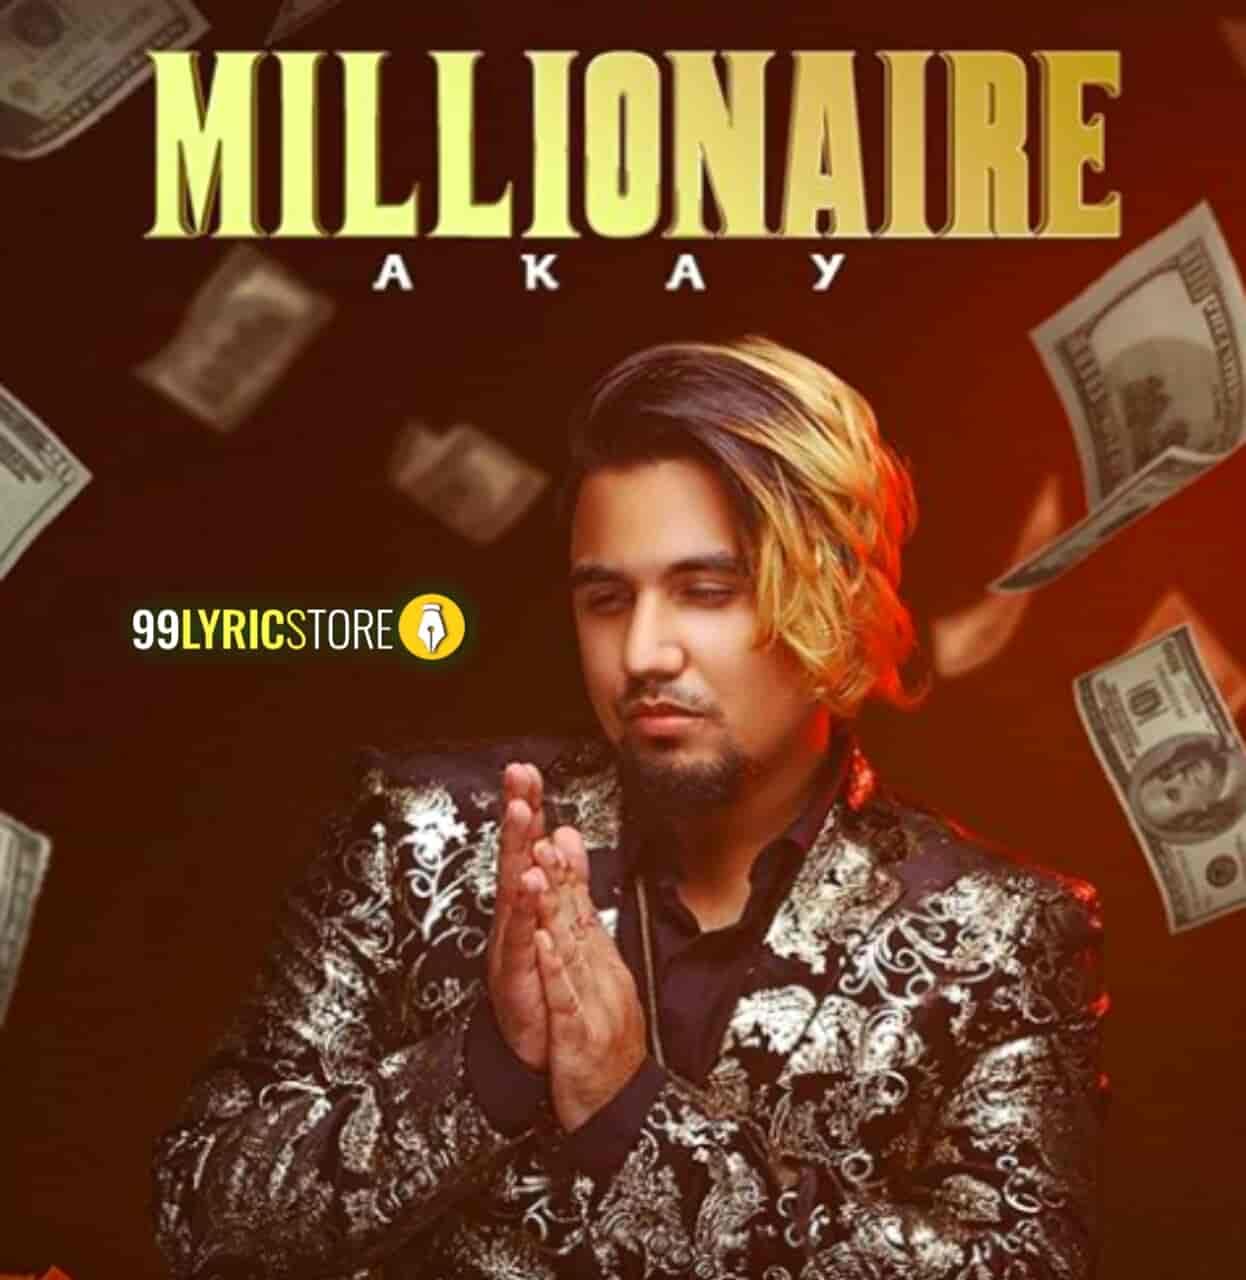 Millionaire Lyrics Images A Kay